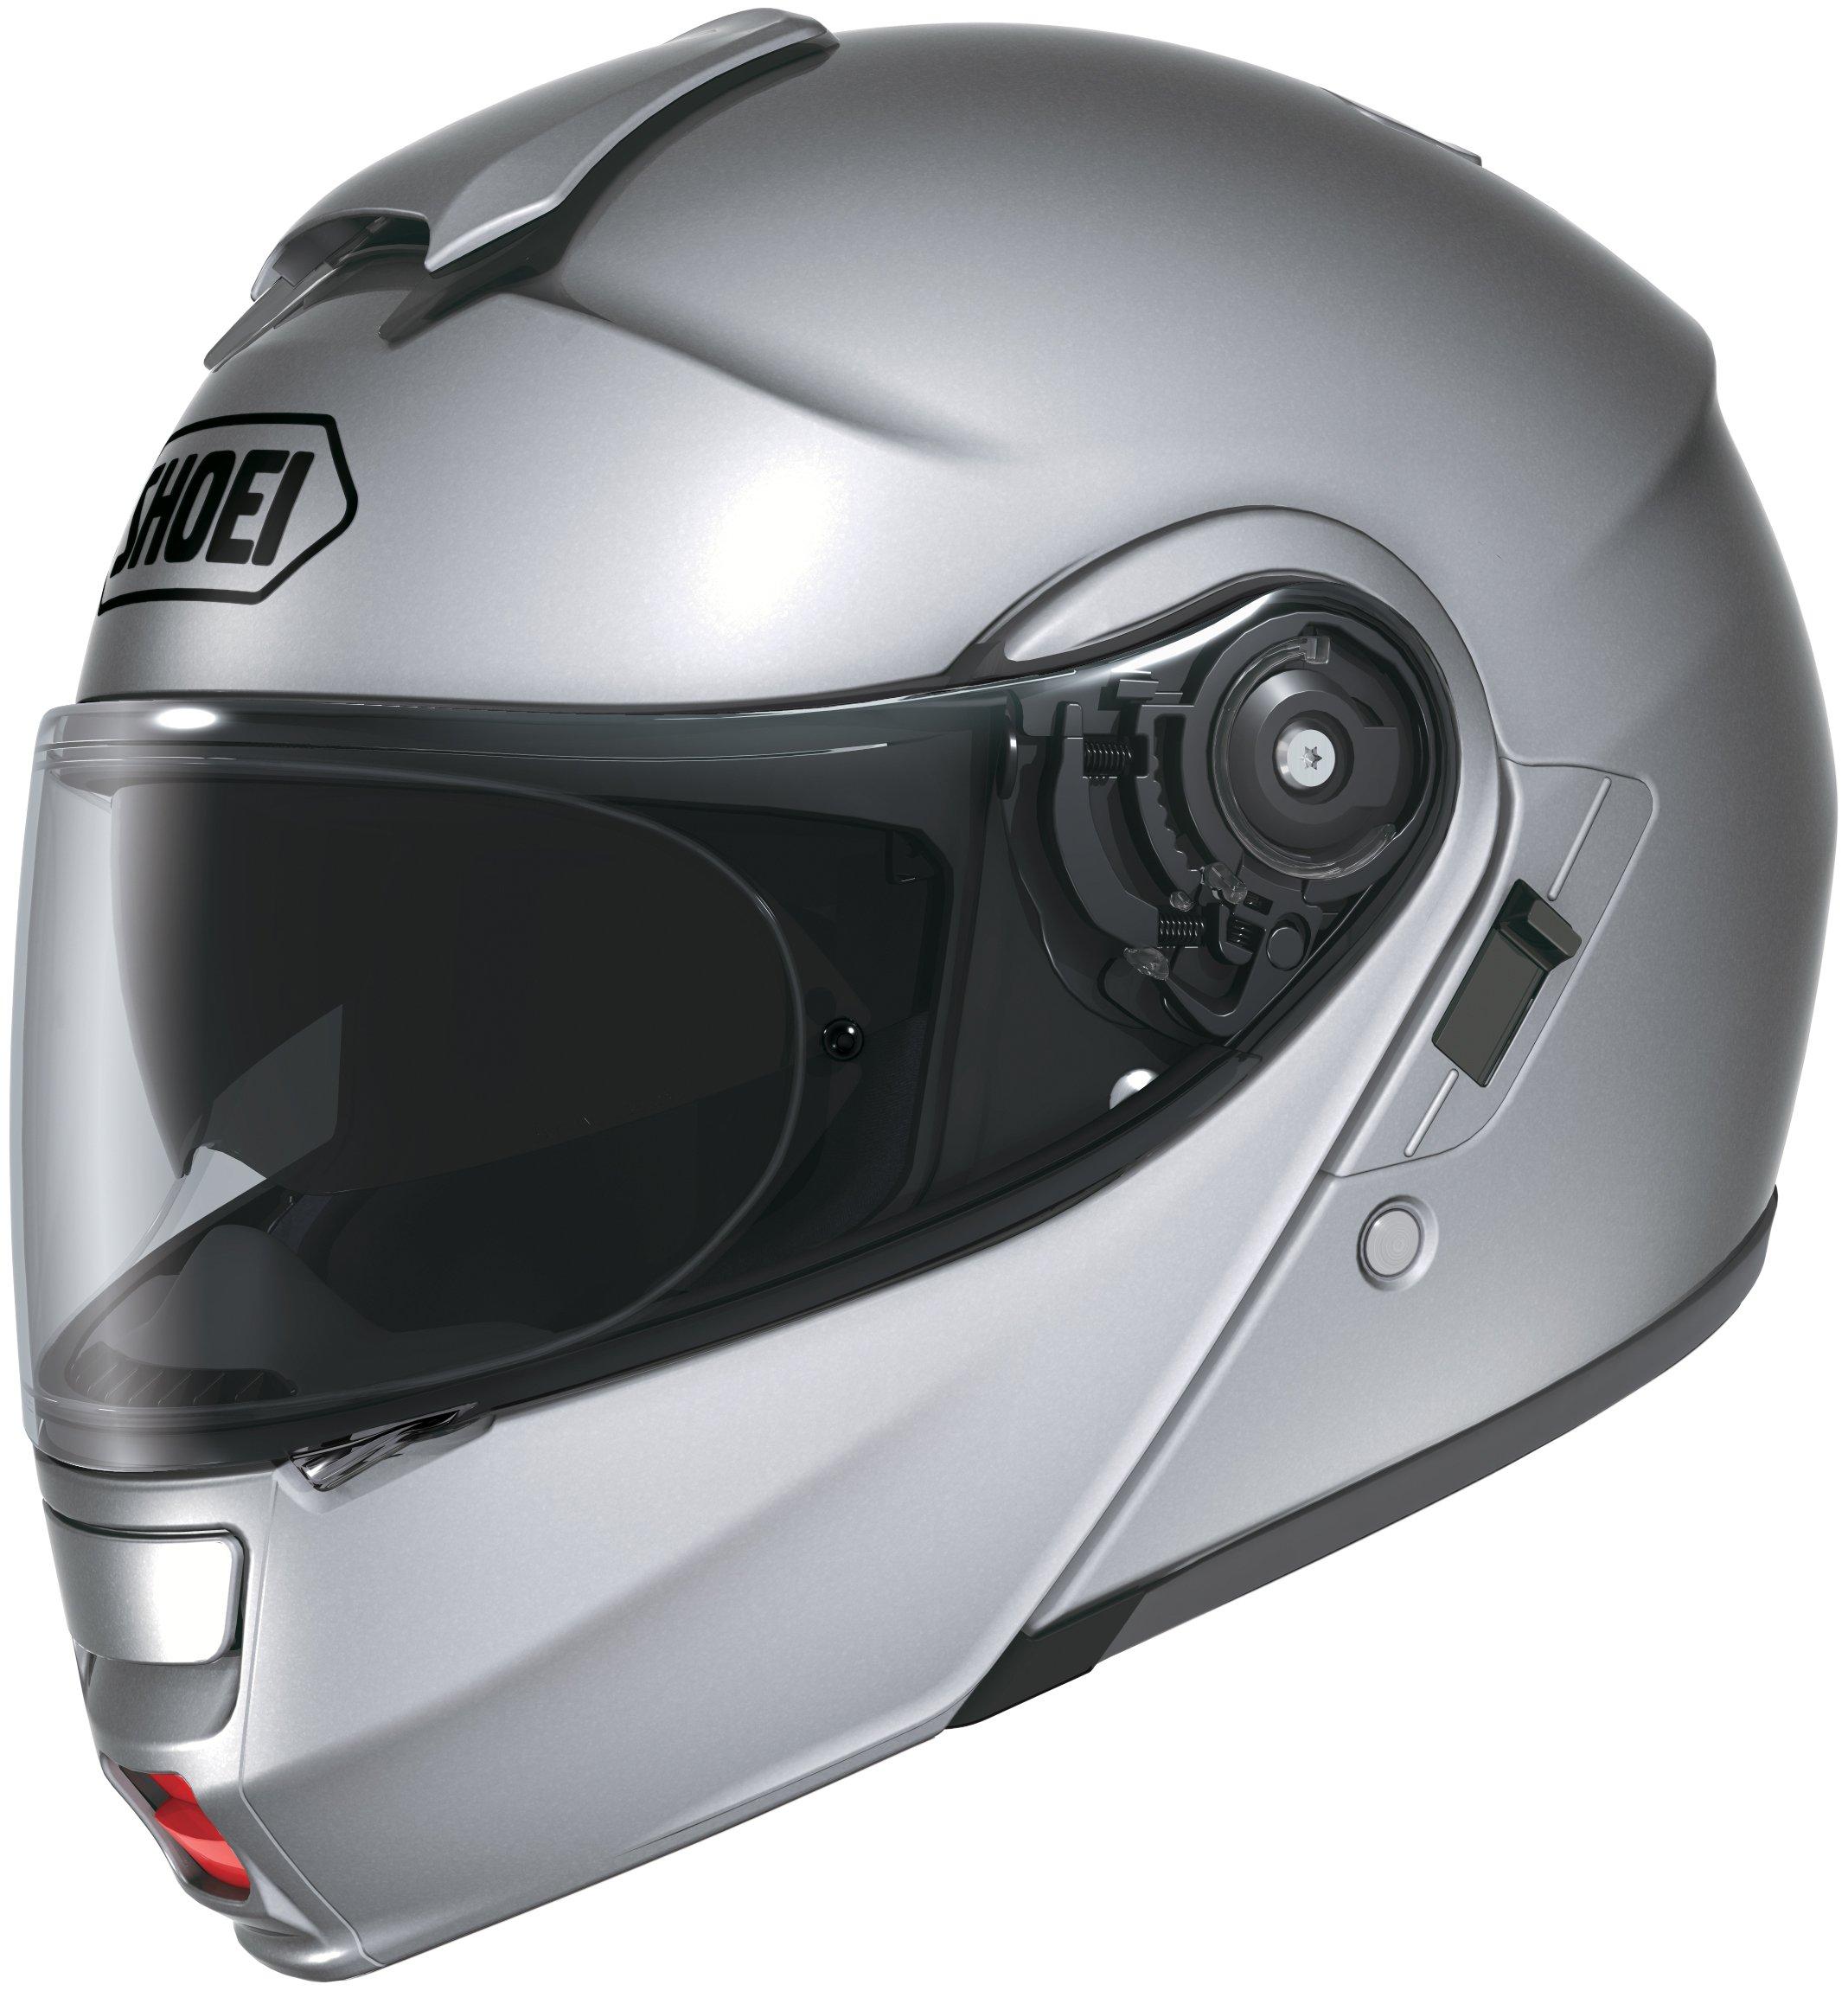 Shoei Neotec Modular Flip-Up Chin Bar / Shield Motorcycle Touring Street Helmet